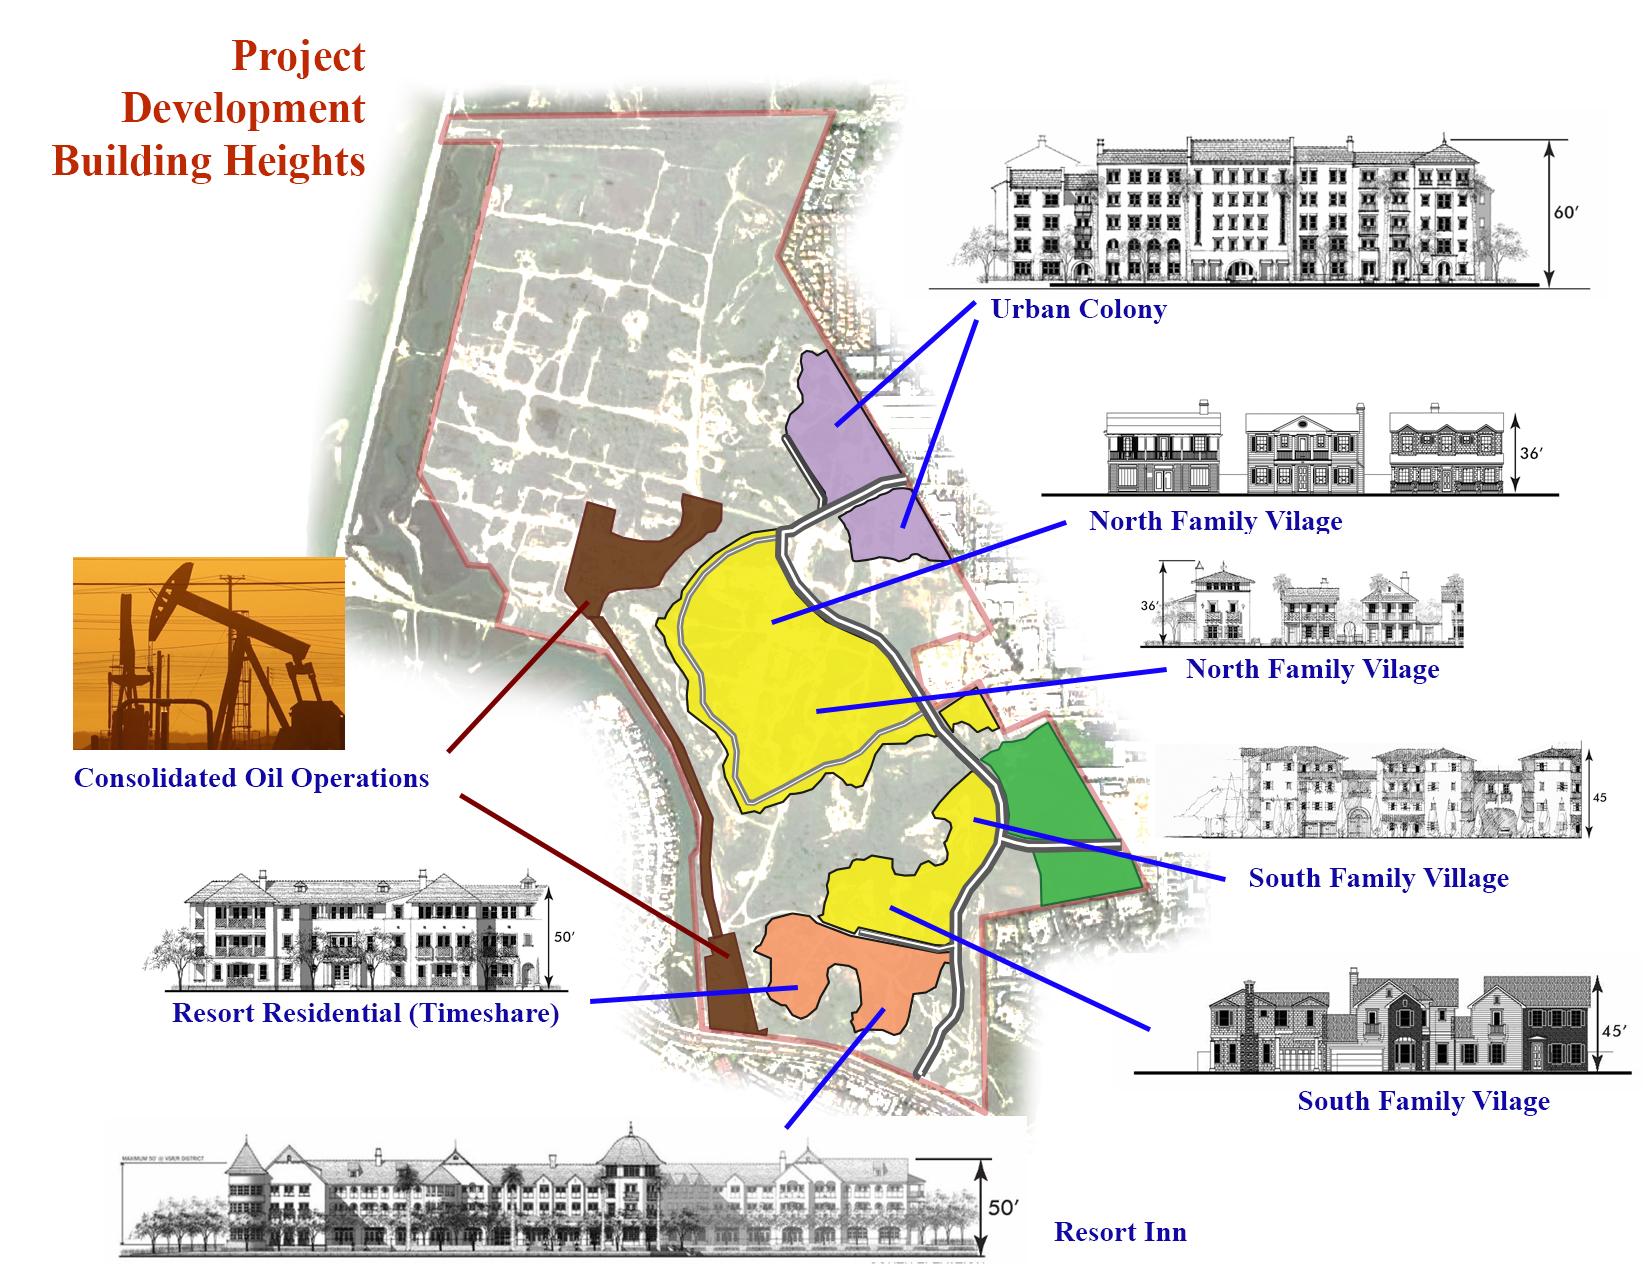 Project Development Building Heights